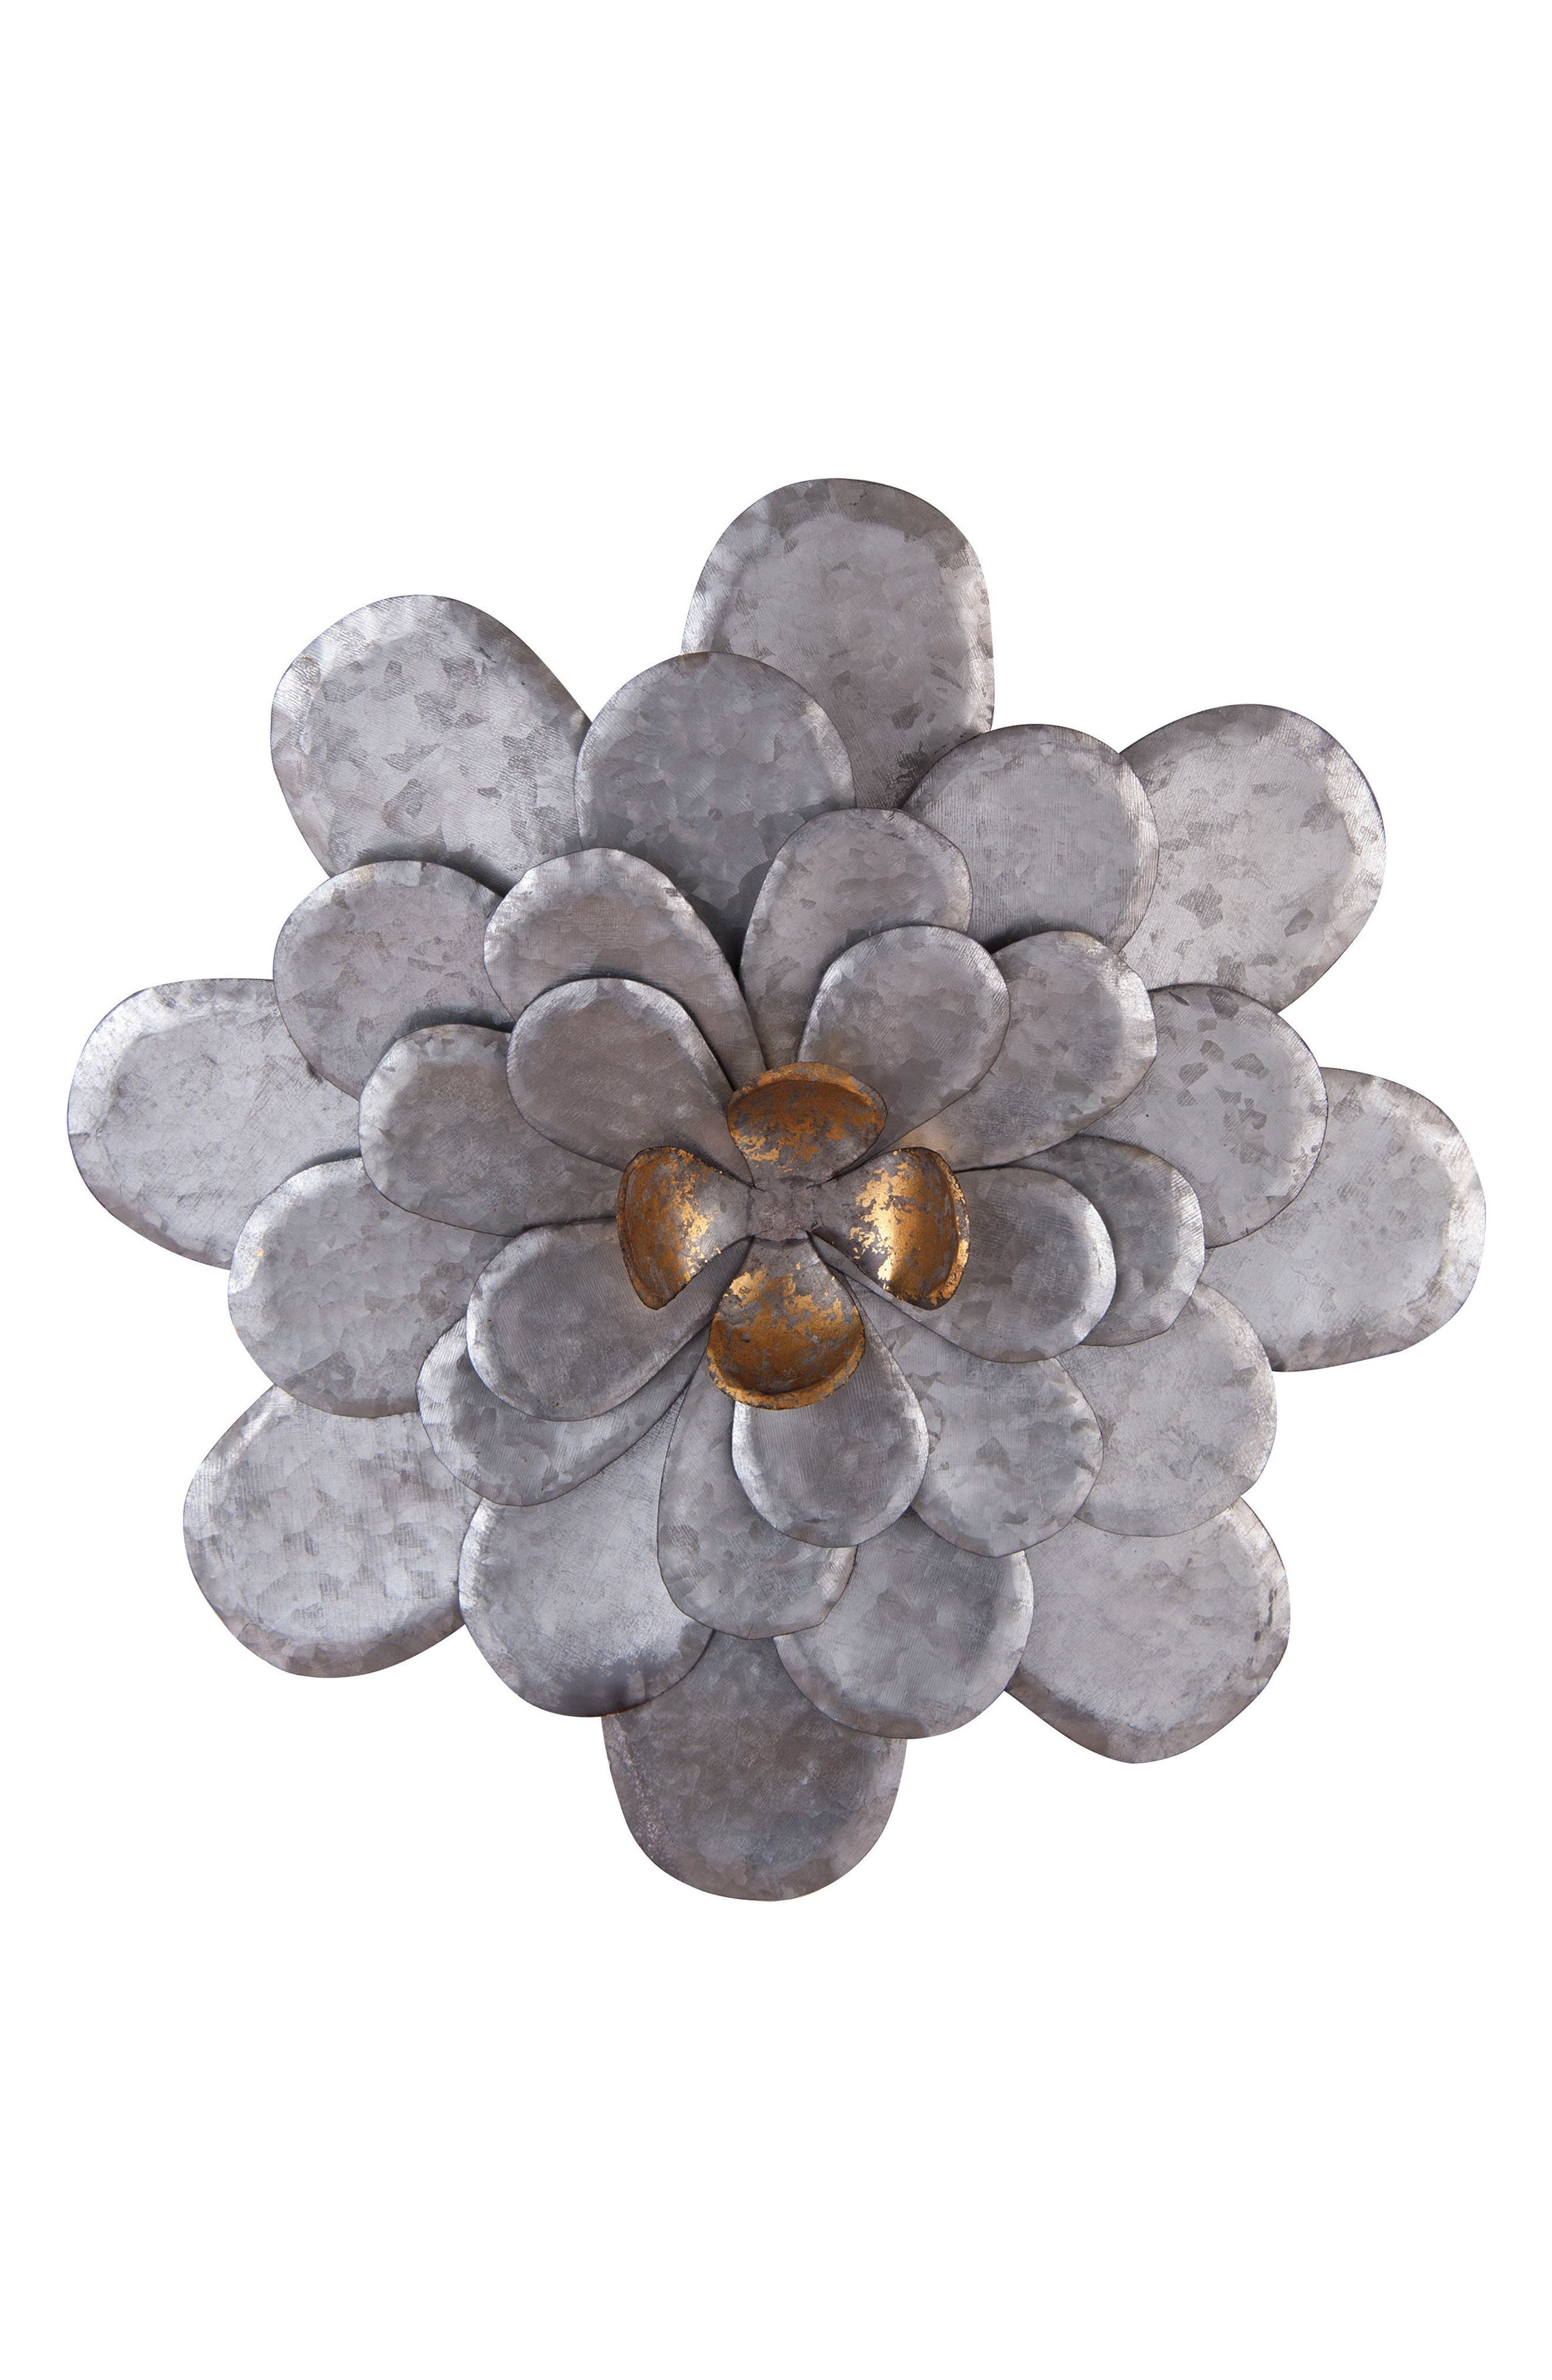 Main Image - Foreside Flower Wall Art